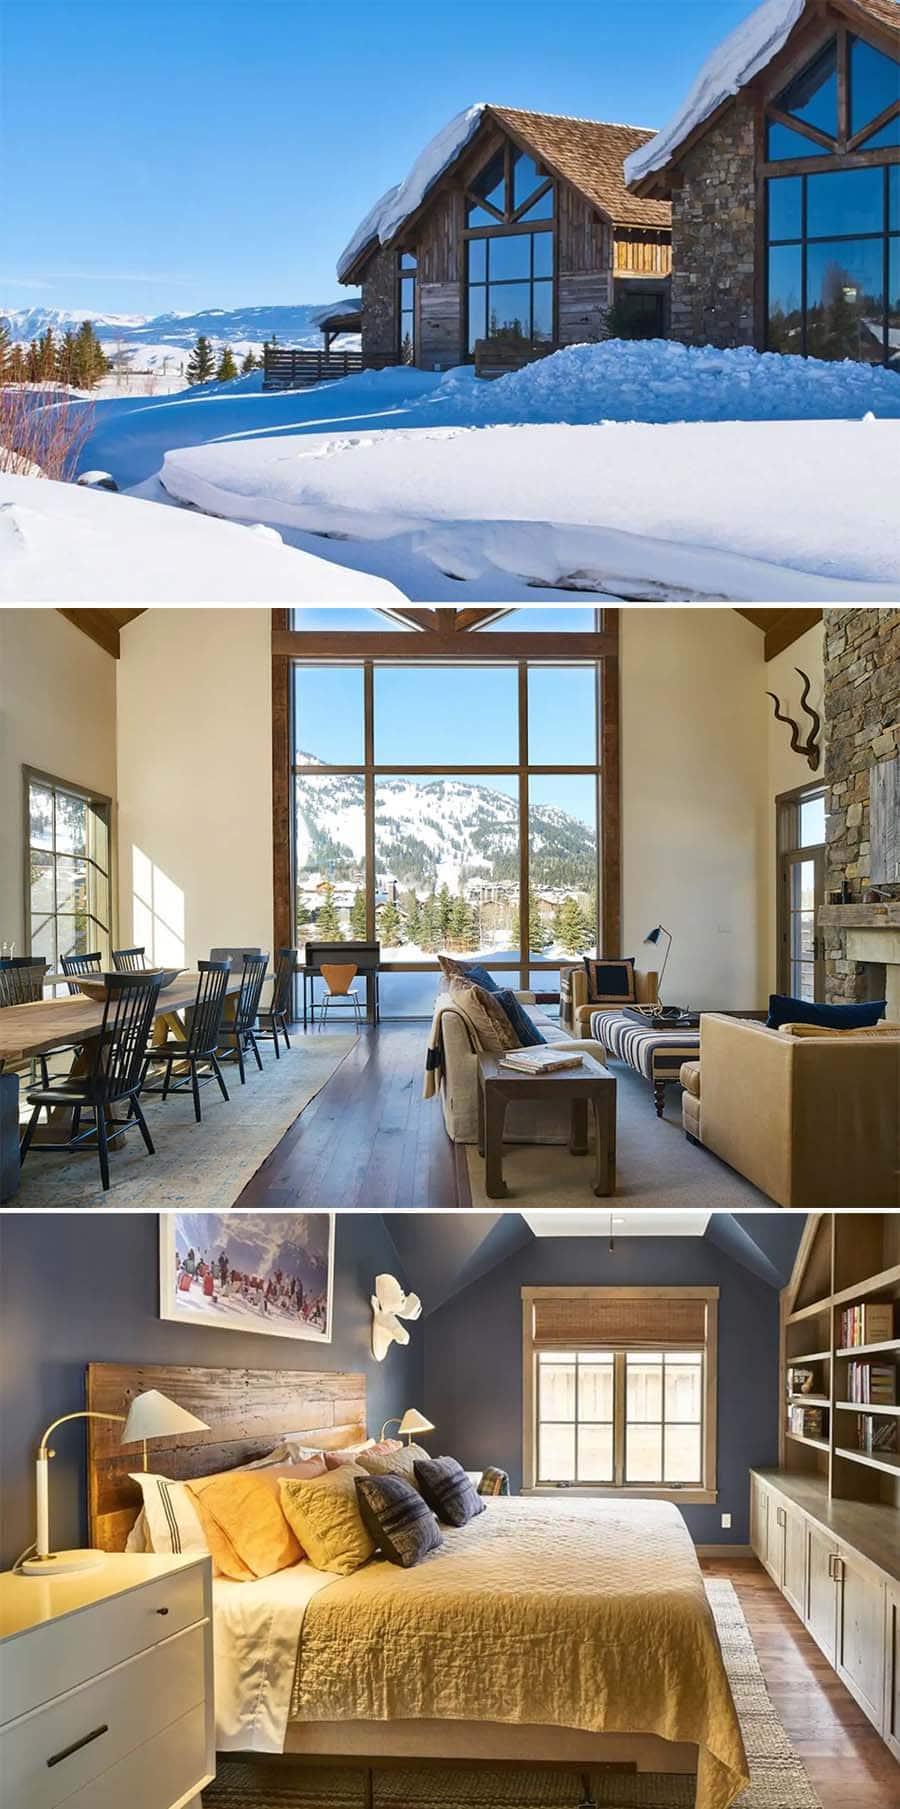 Shooting Star cabin - luxury cabin airbnbs in Jacksonhole, Wyoming